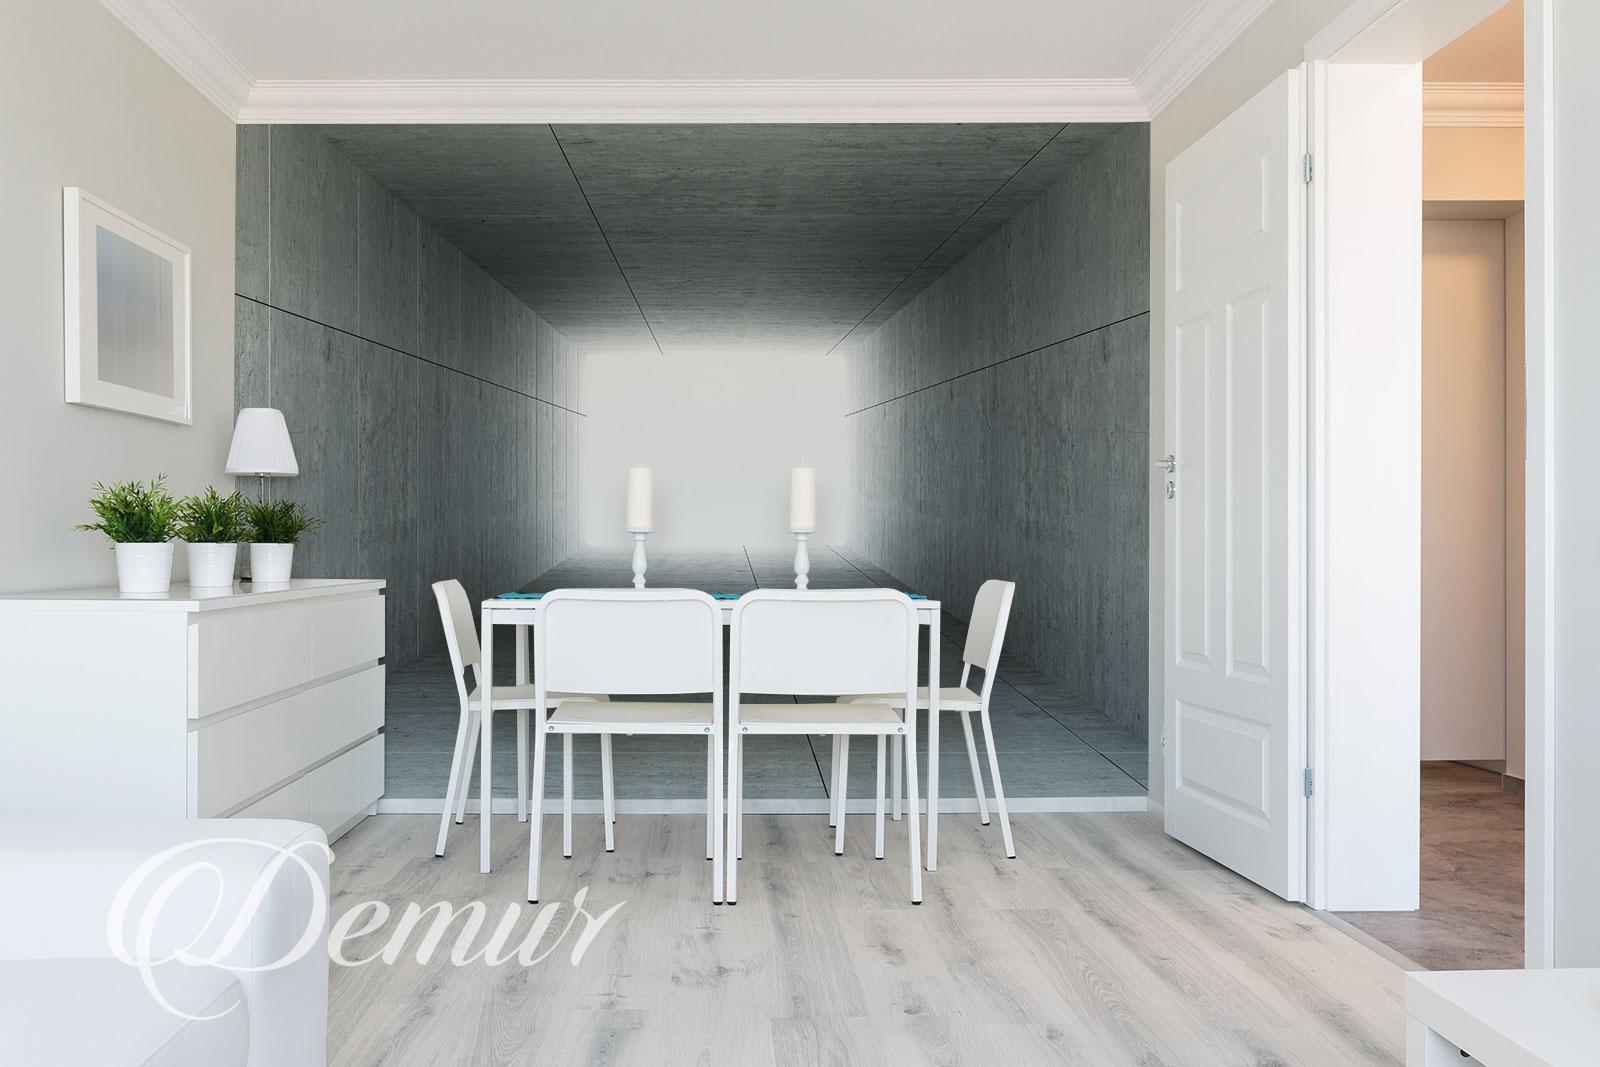 Fototapeta - Betonowy Tunel 3D - Fototapeta do małego salonu - Demur